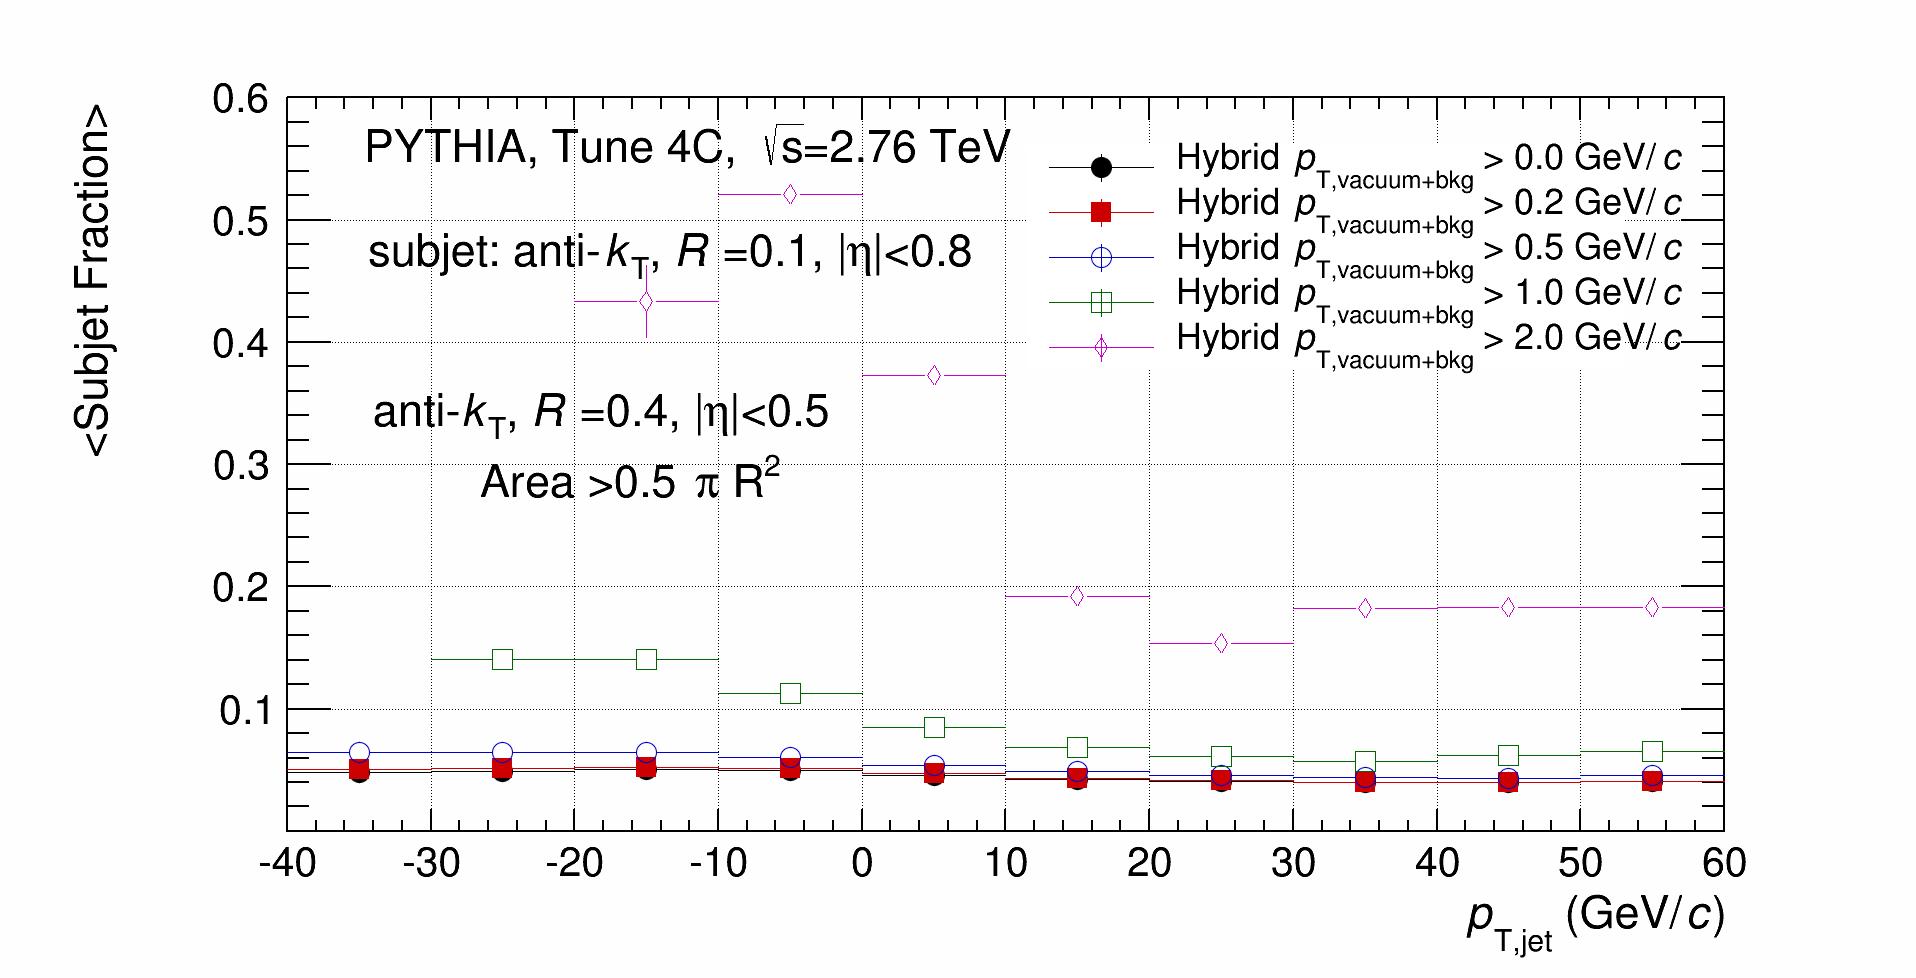 Hybrid_SubjetFraction_MeanValue.png